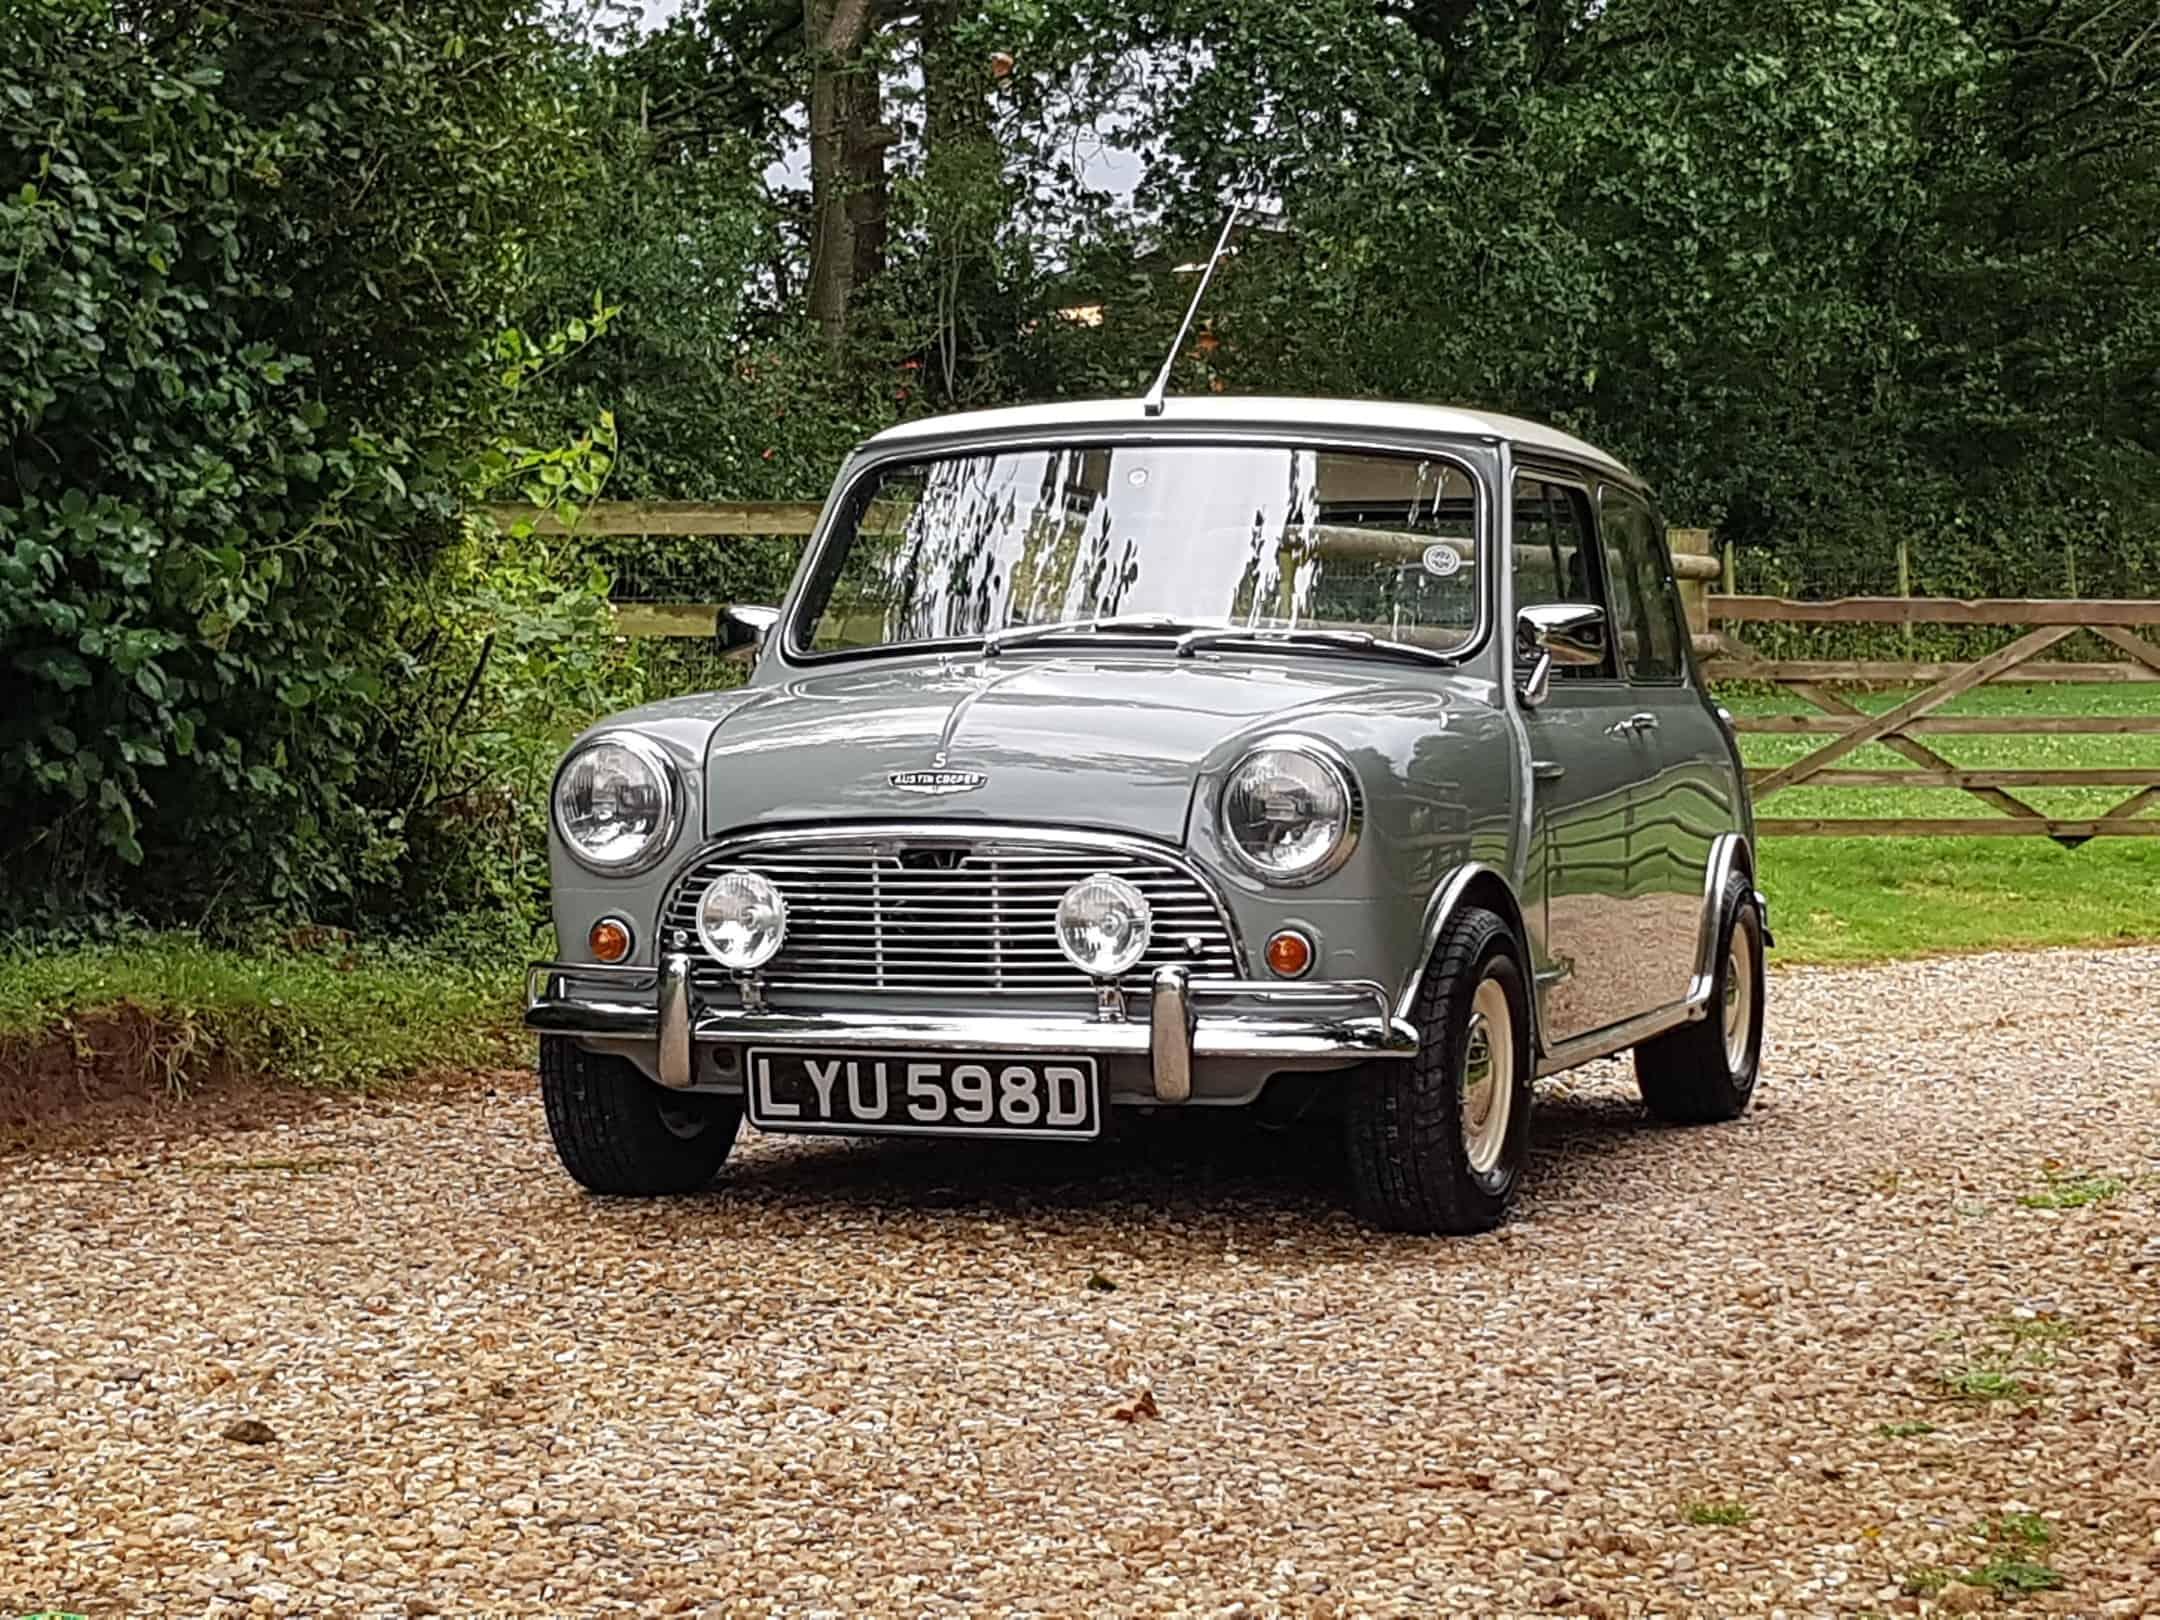 ** NOW SOLD ** 1966 Austin Mini 998 Cooper In Tweed Grey